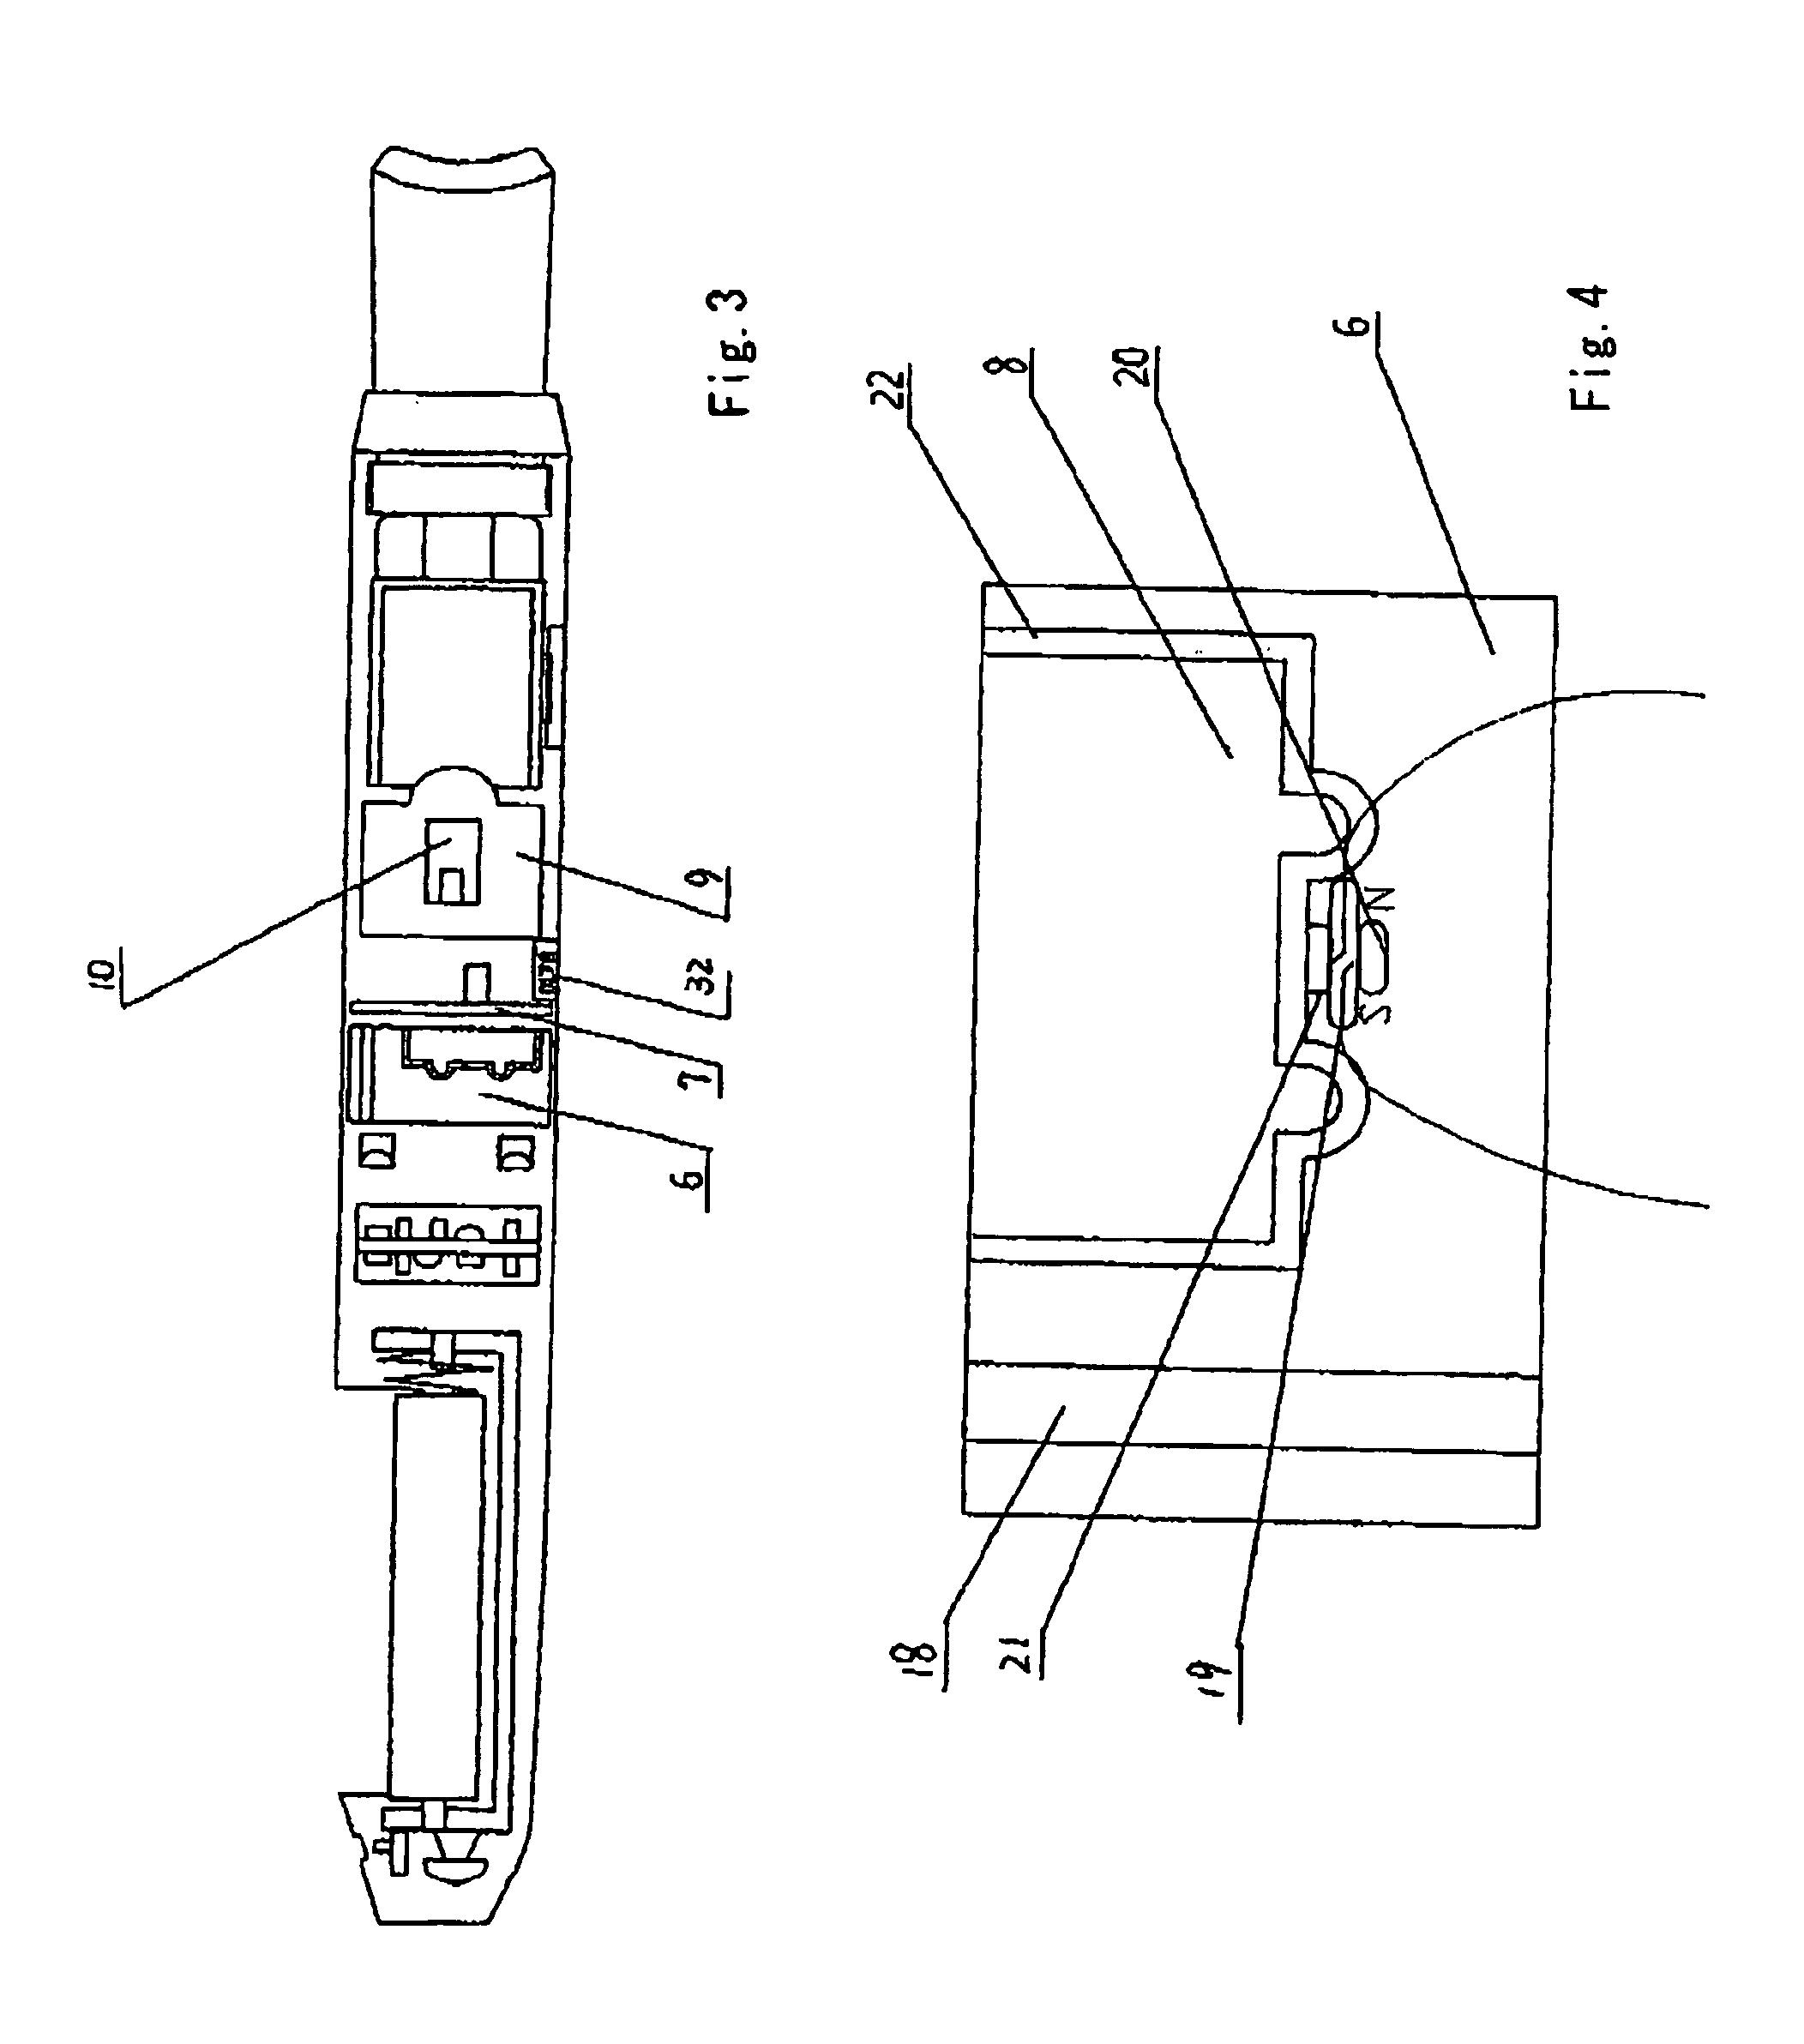 E Cig Schematic – The Wiring Diagram